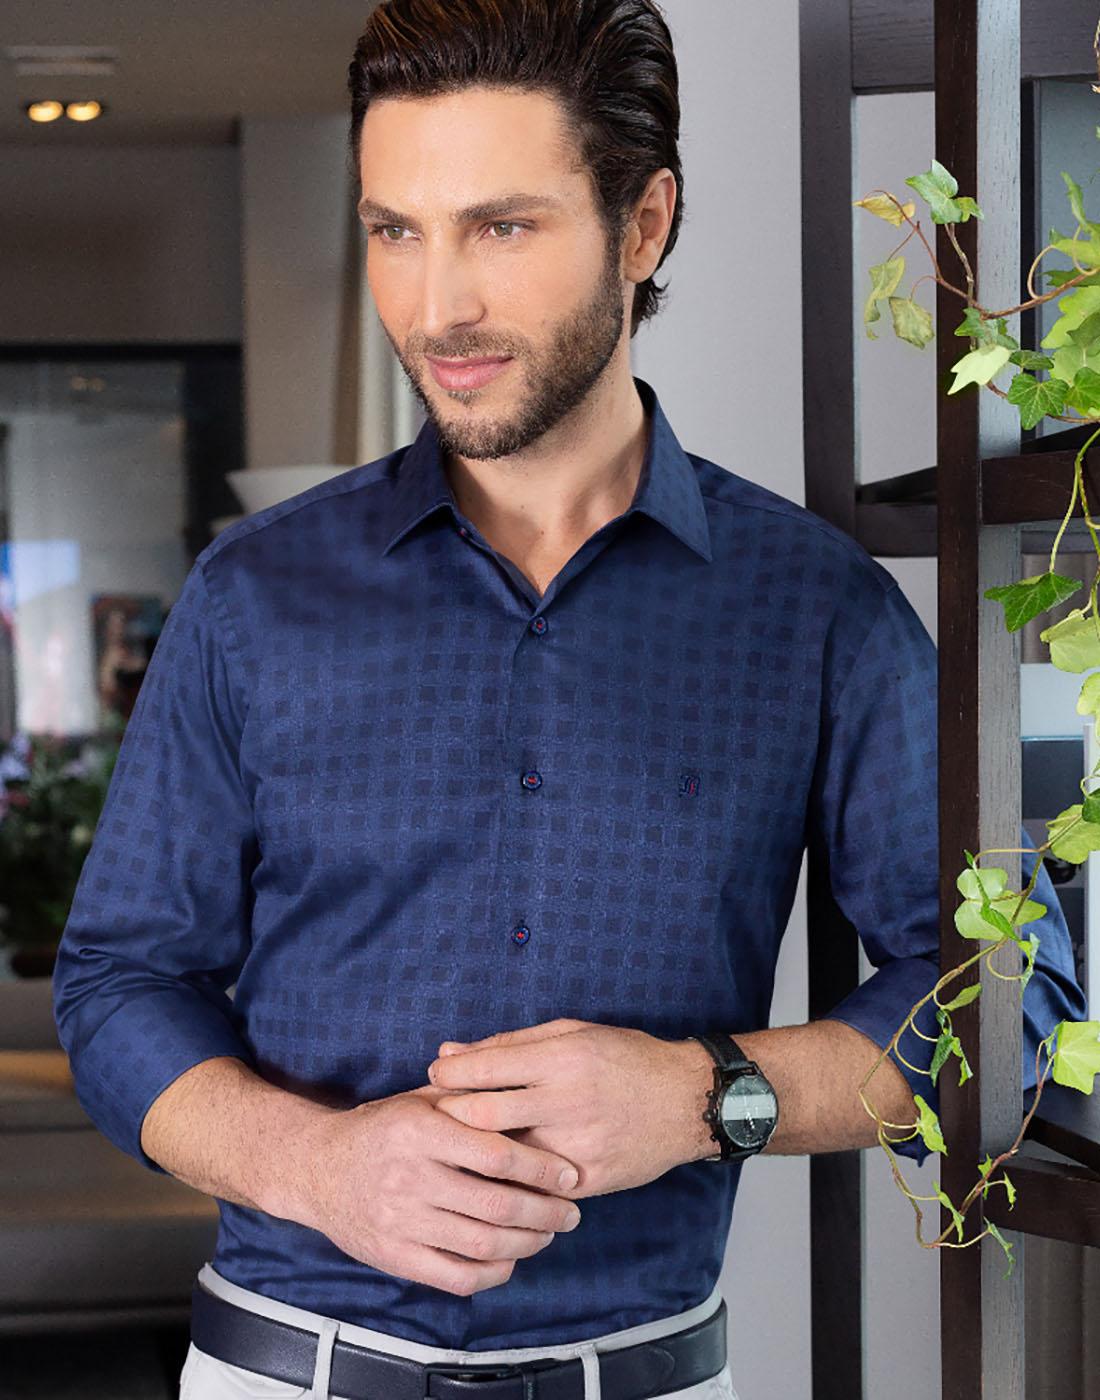 Camisa Manga Longa Estampada Azul Marinho Baumgarten Elegance